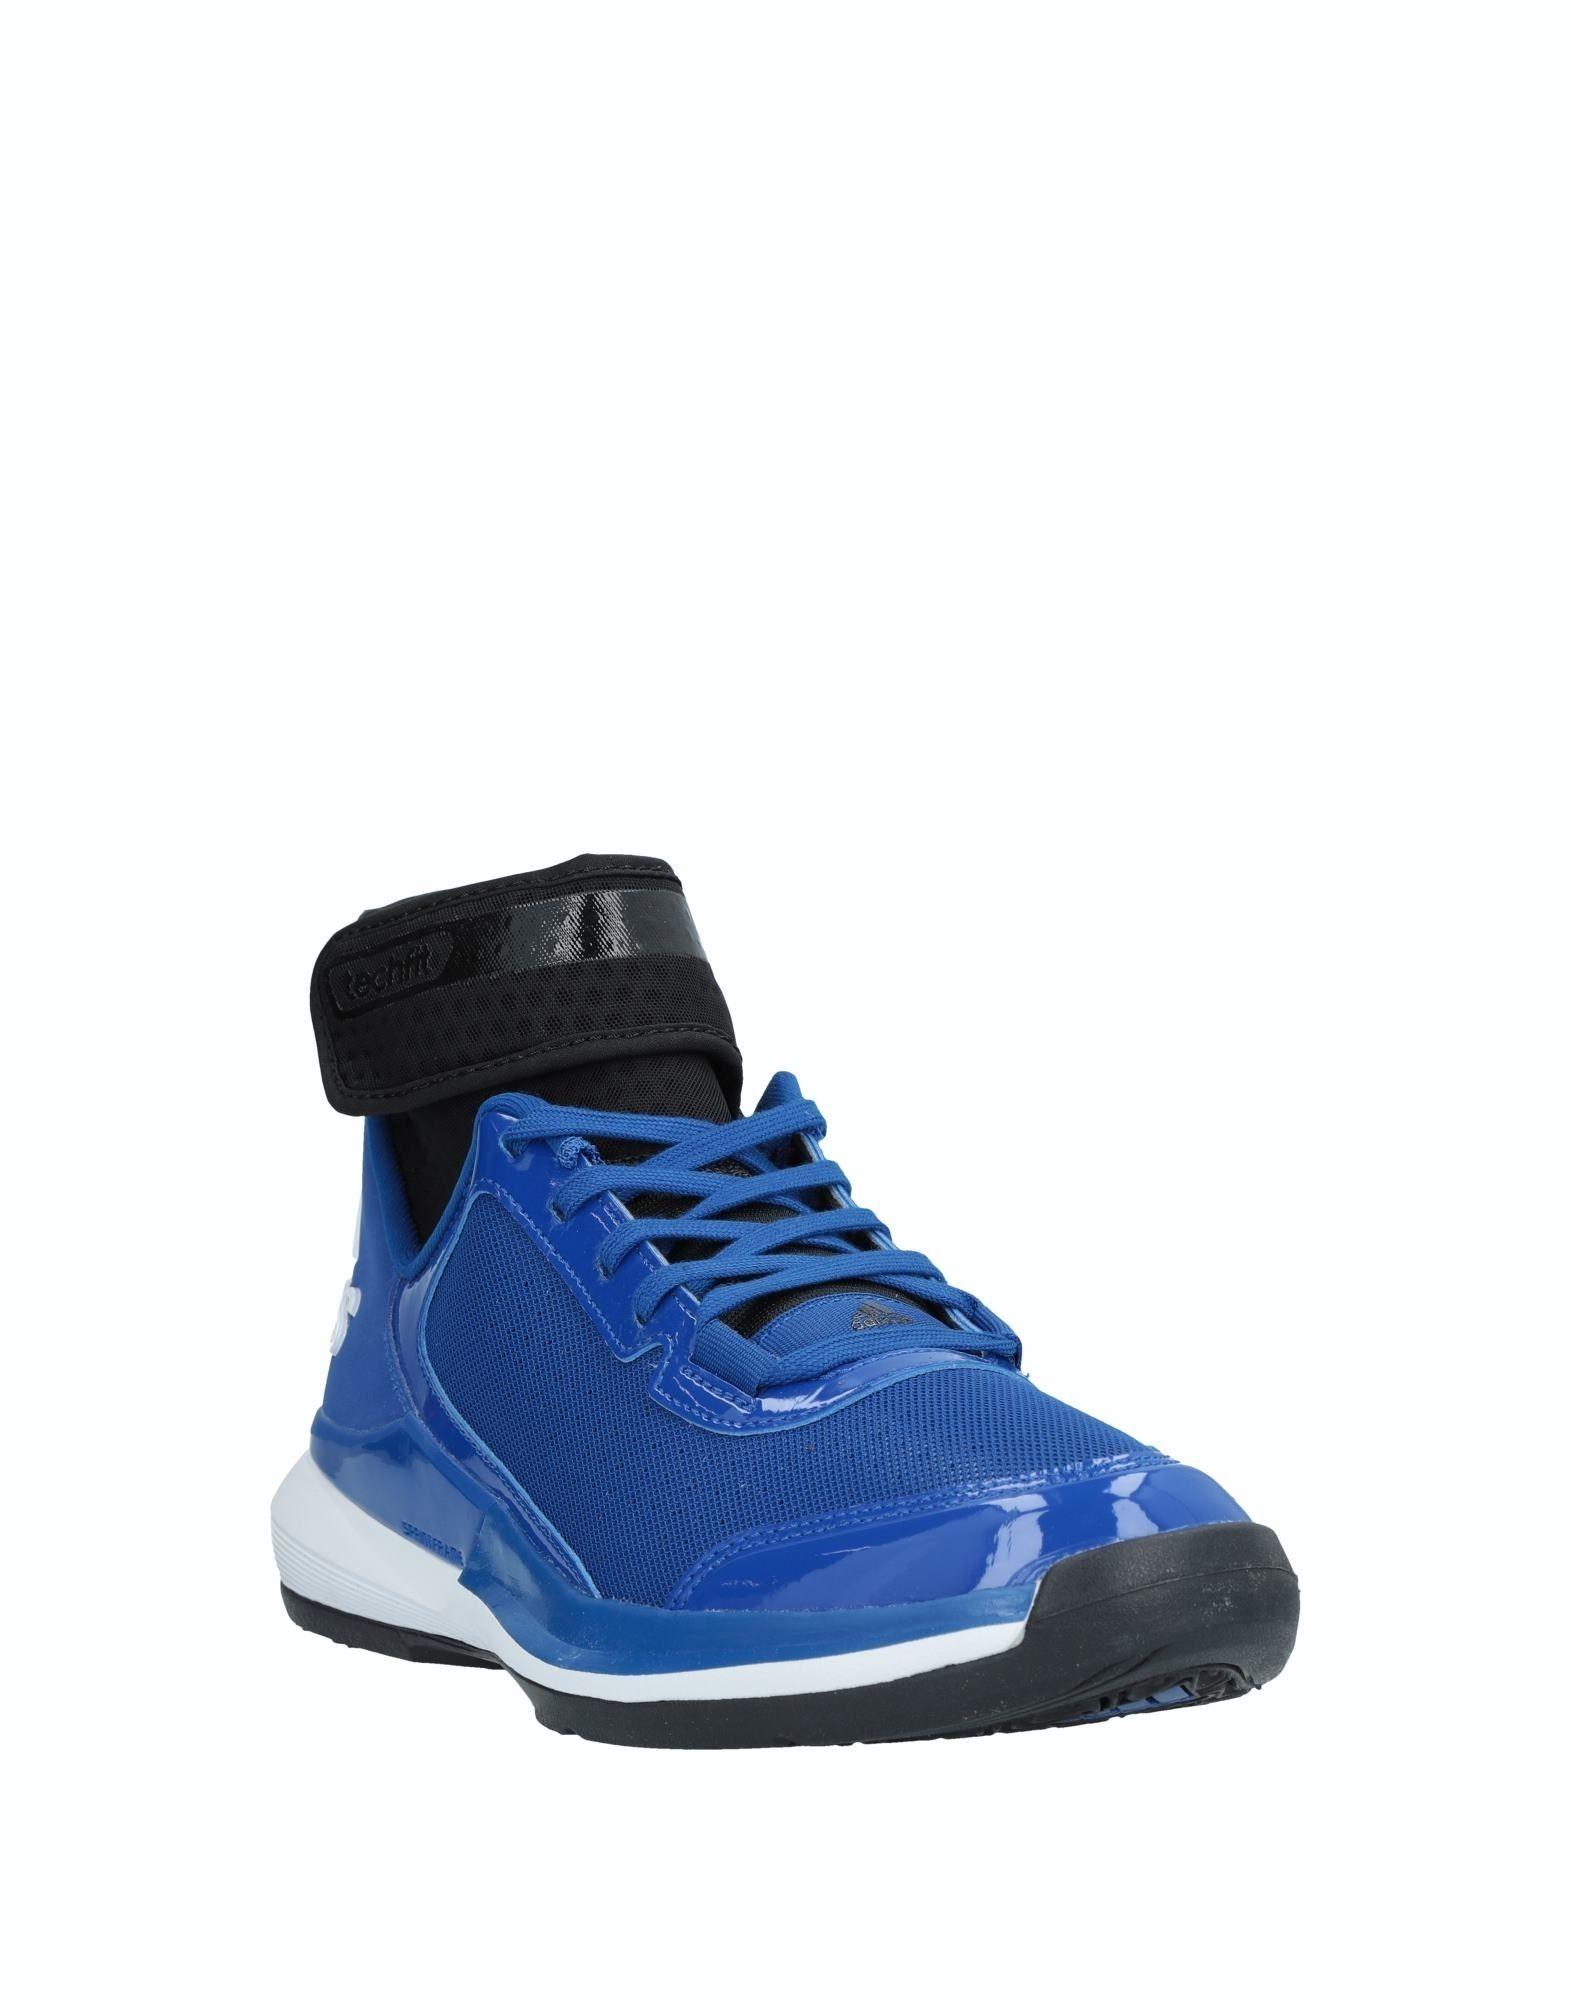 Rabatt echte Schuhe Herren Adidas Sneakers Herren Schuhe  11538872HO ed067b